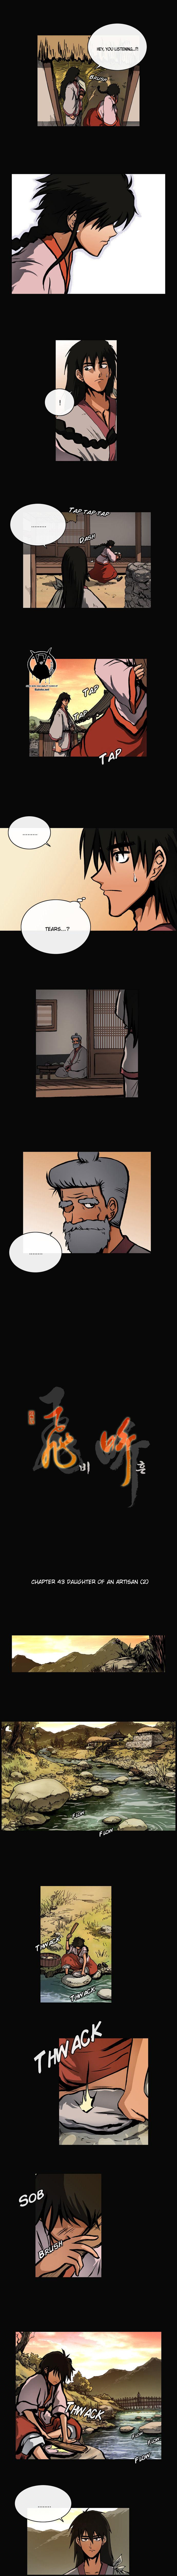 Be Heun 43 Page 2